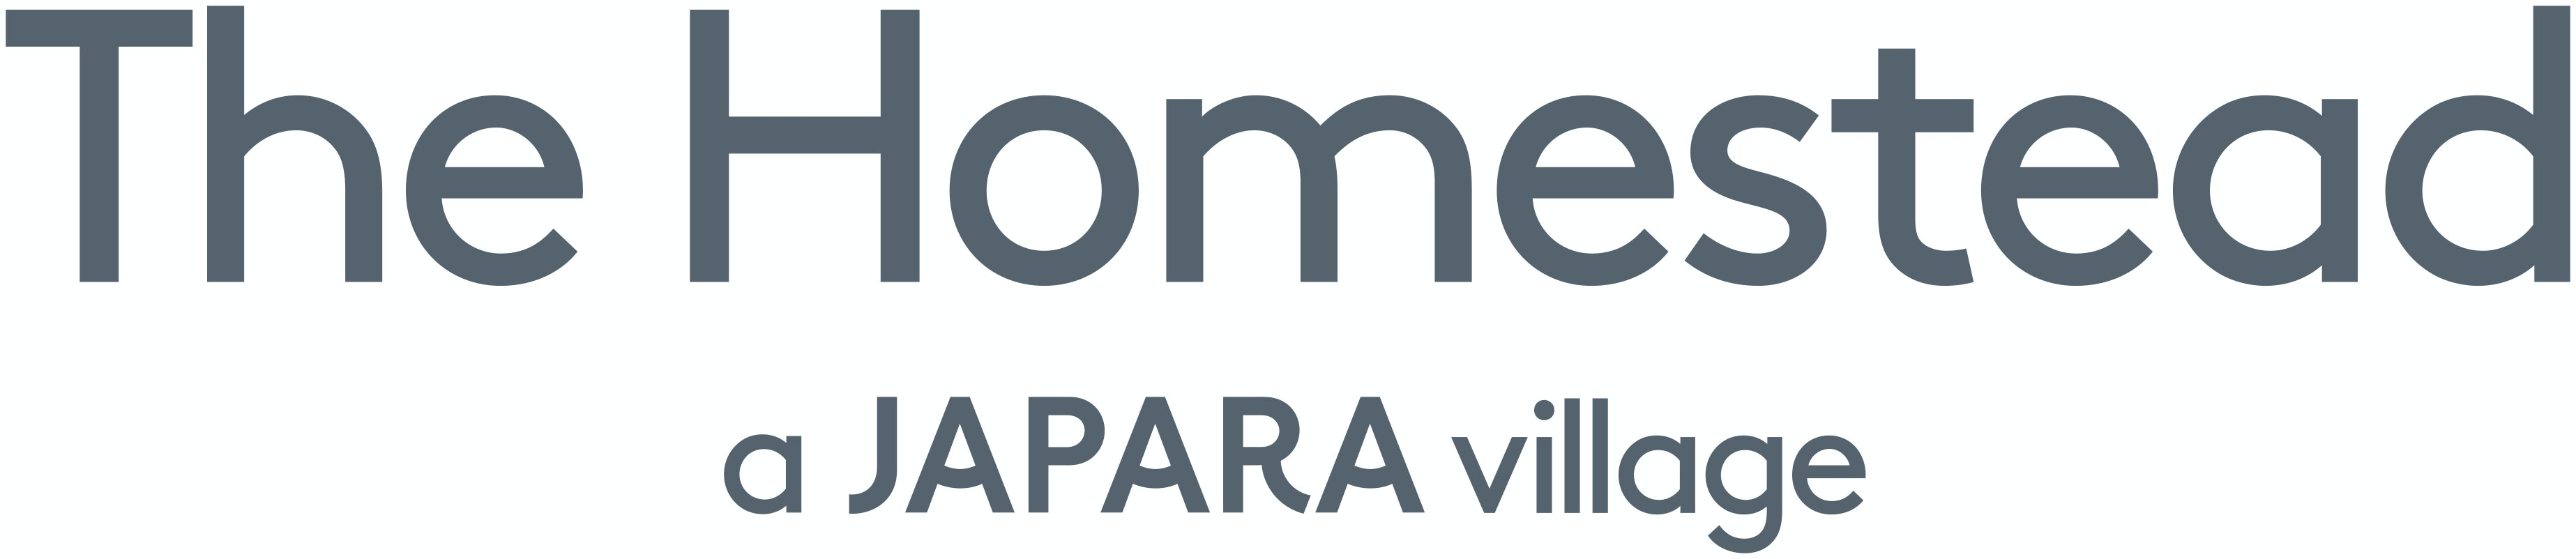 The Homestead Serviced Apartments logo